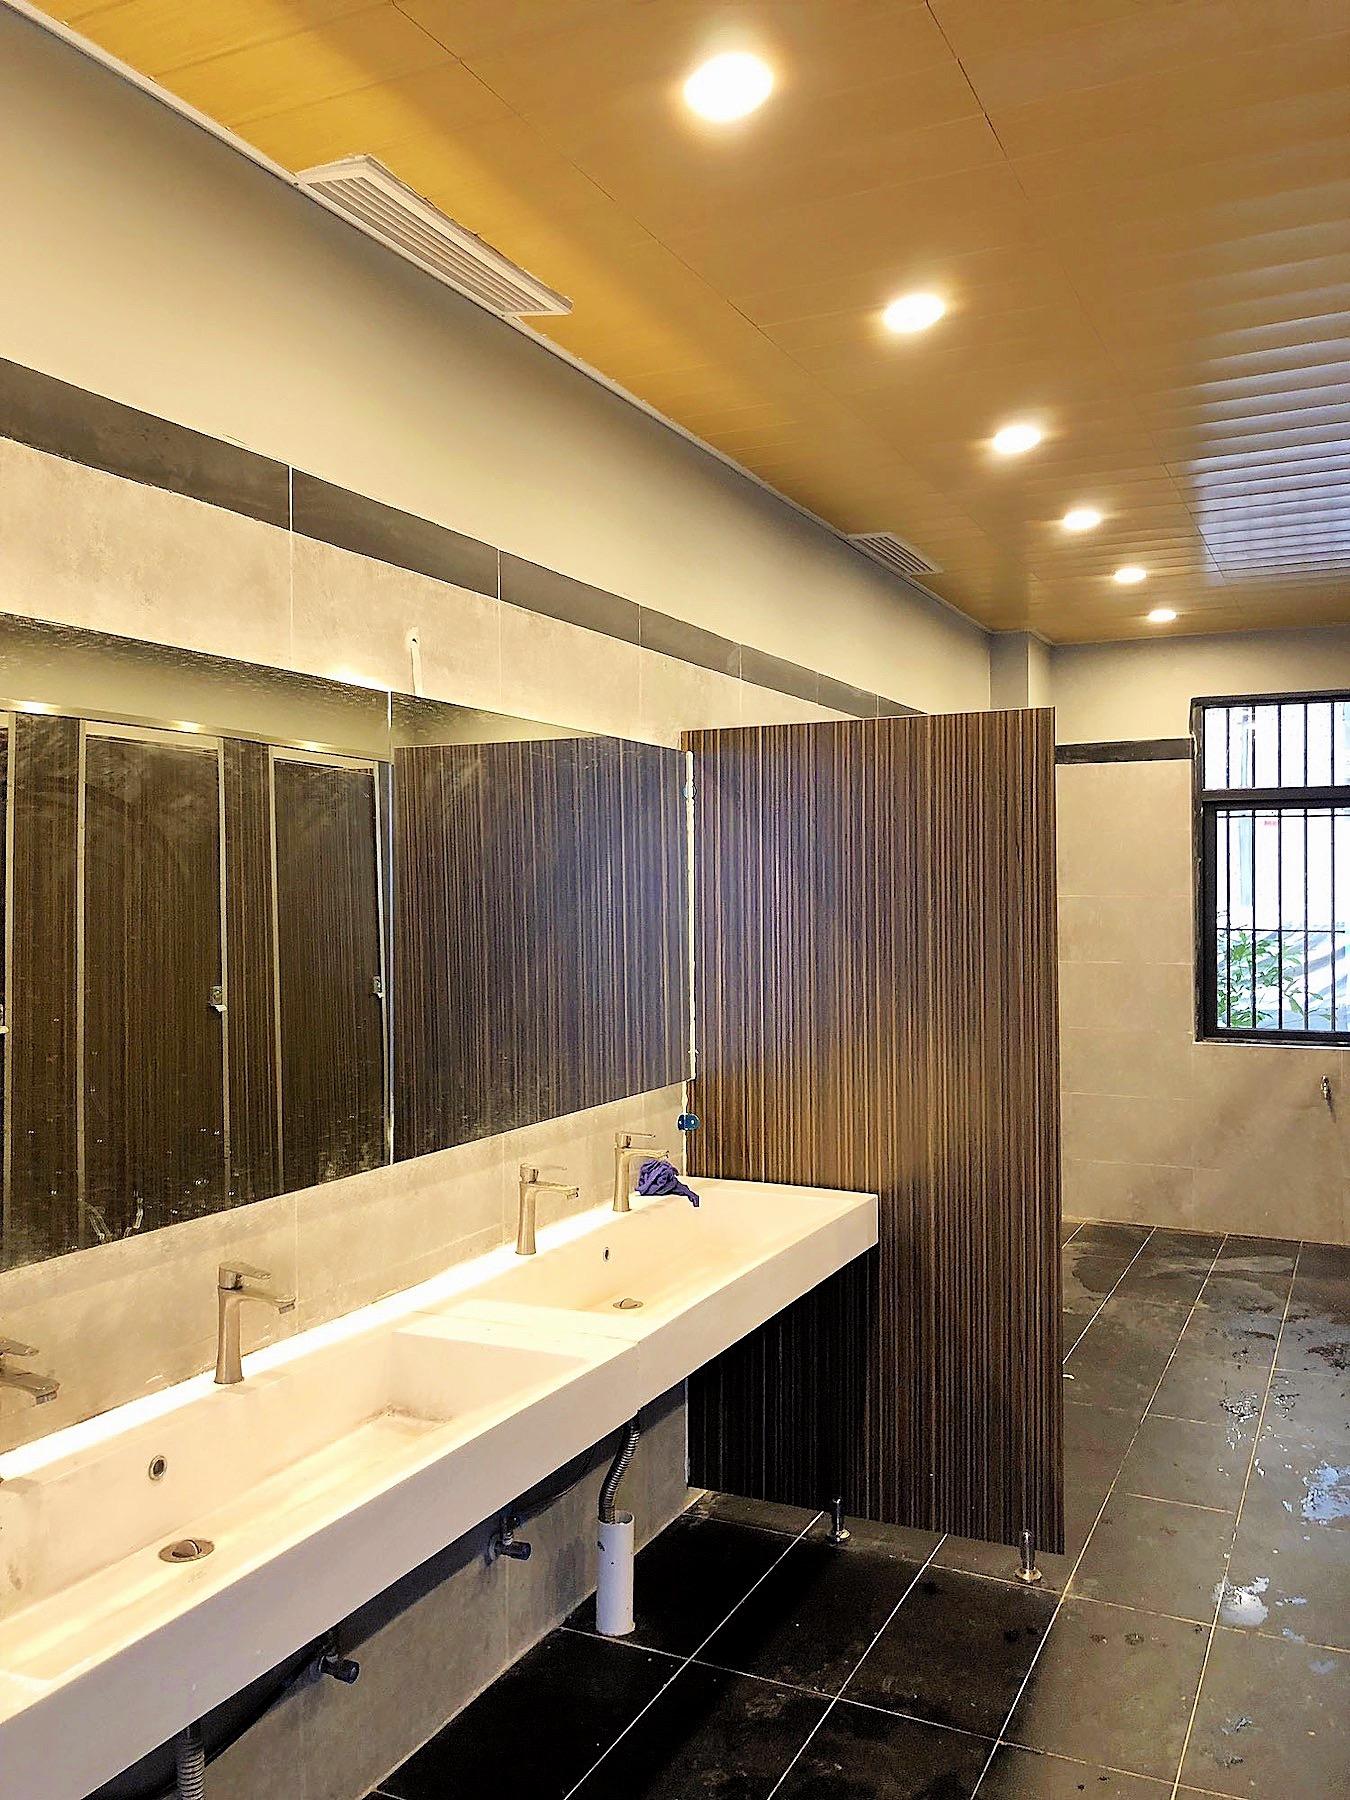 Grandway Office Renovation 2018 Sfaff Toliet 004